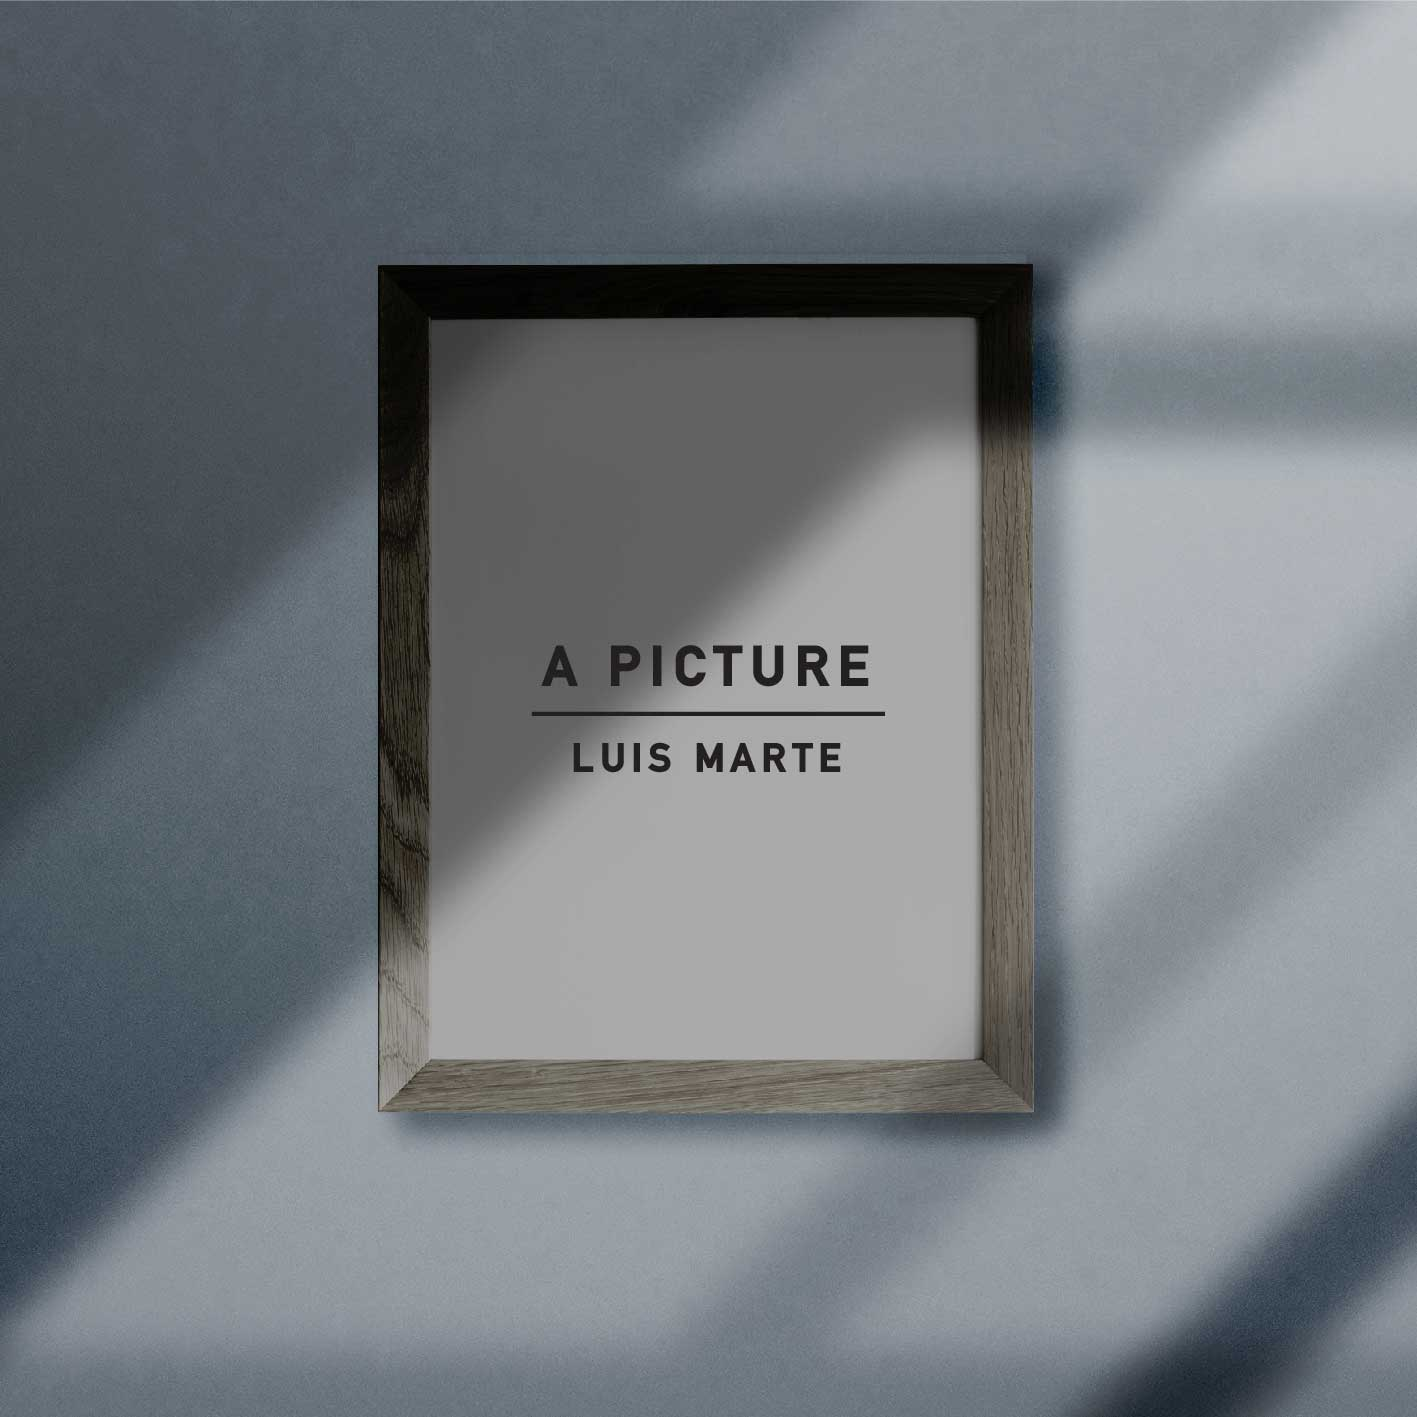 LUIS MARTE – A PICTURE